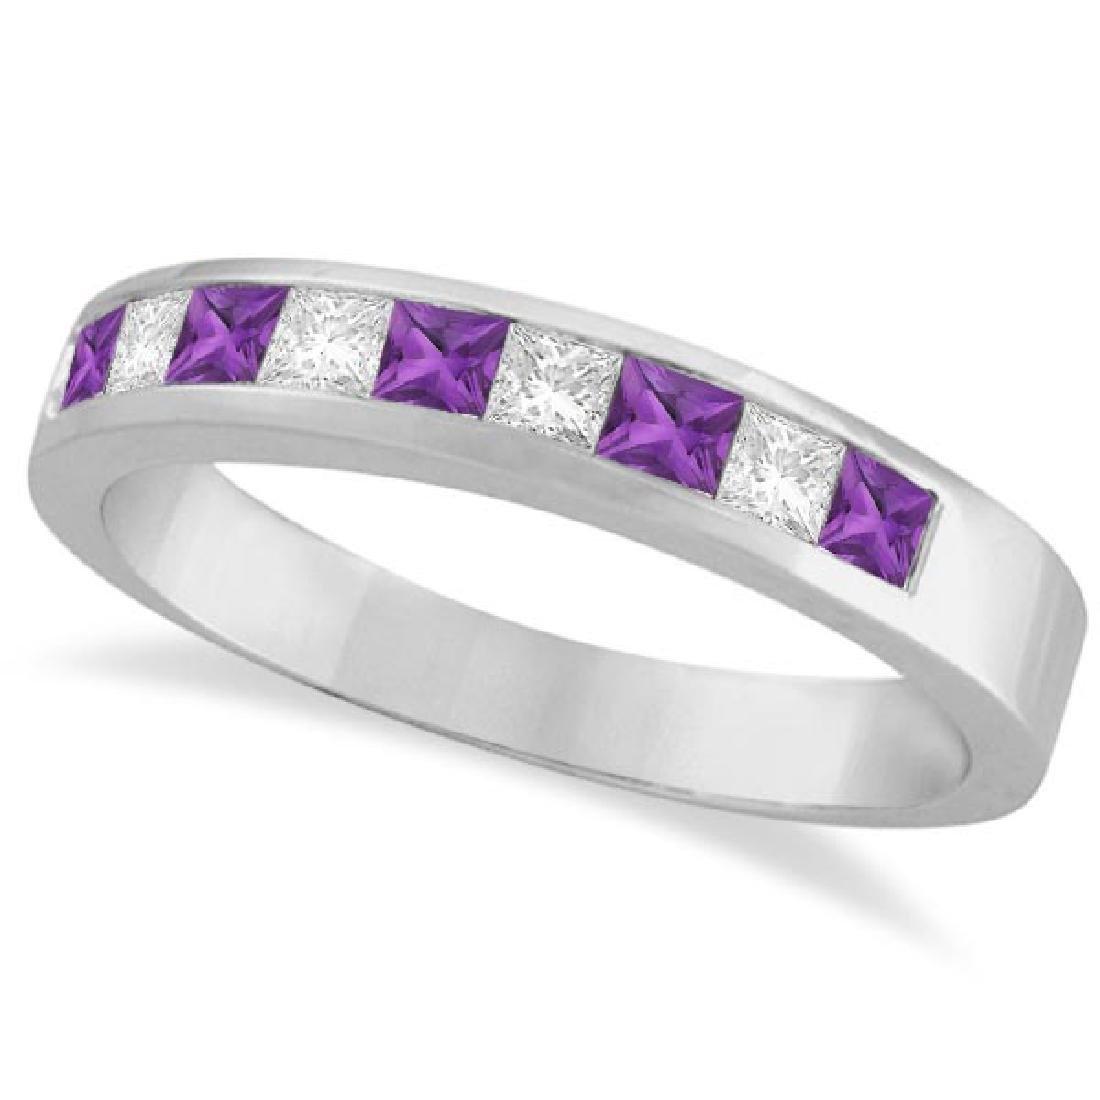 Princess Channel-Set Diamond and Amethyst Ring Band 14K